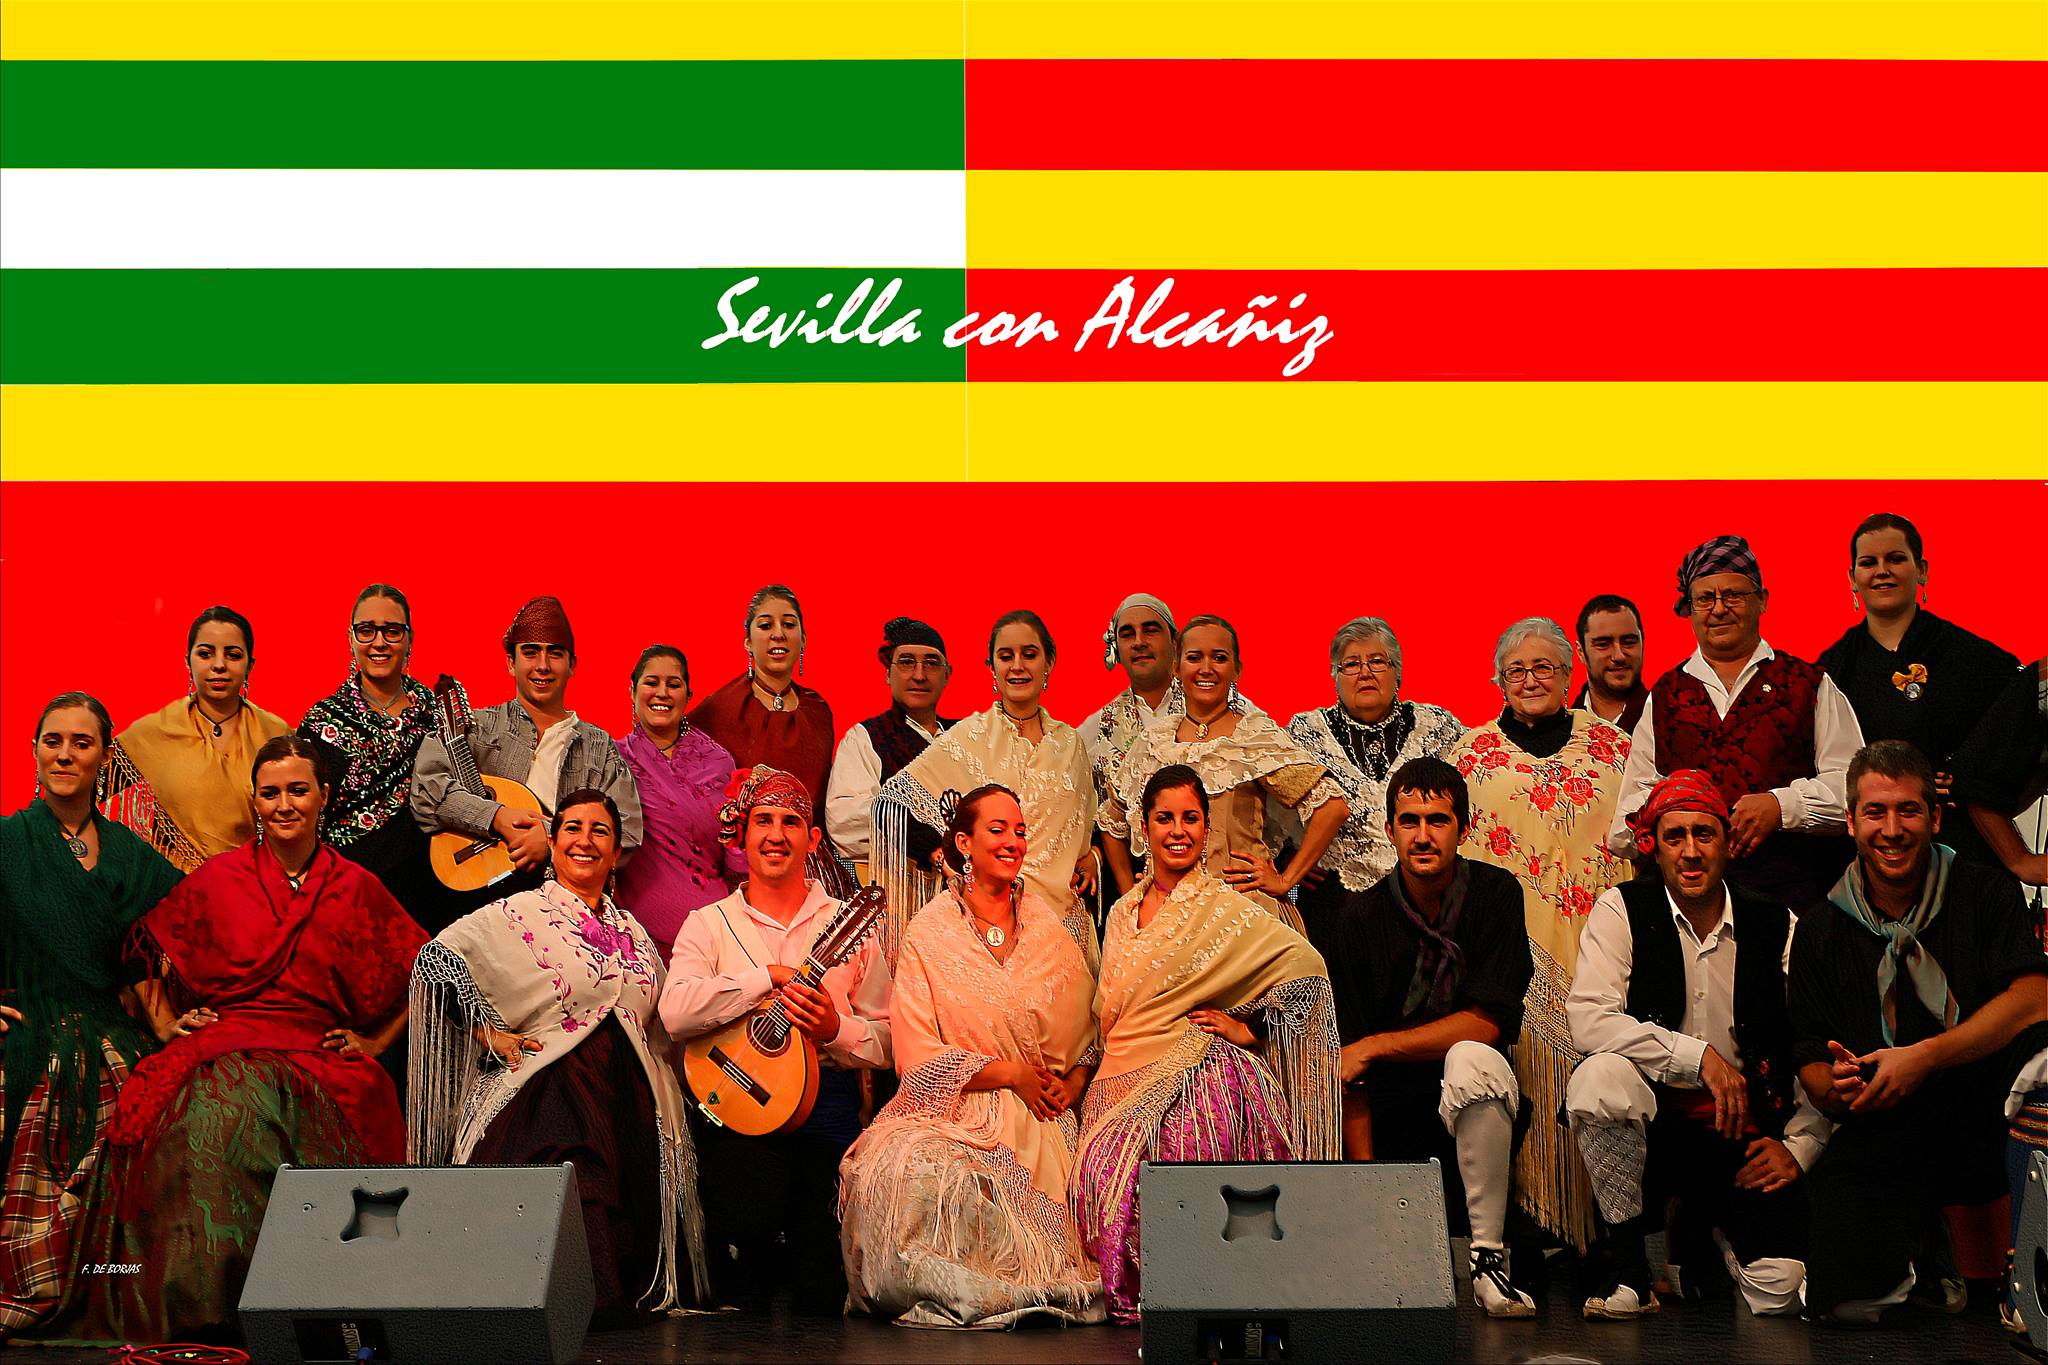 Grupo Folclorico Malandia